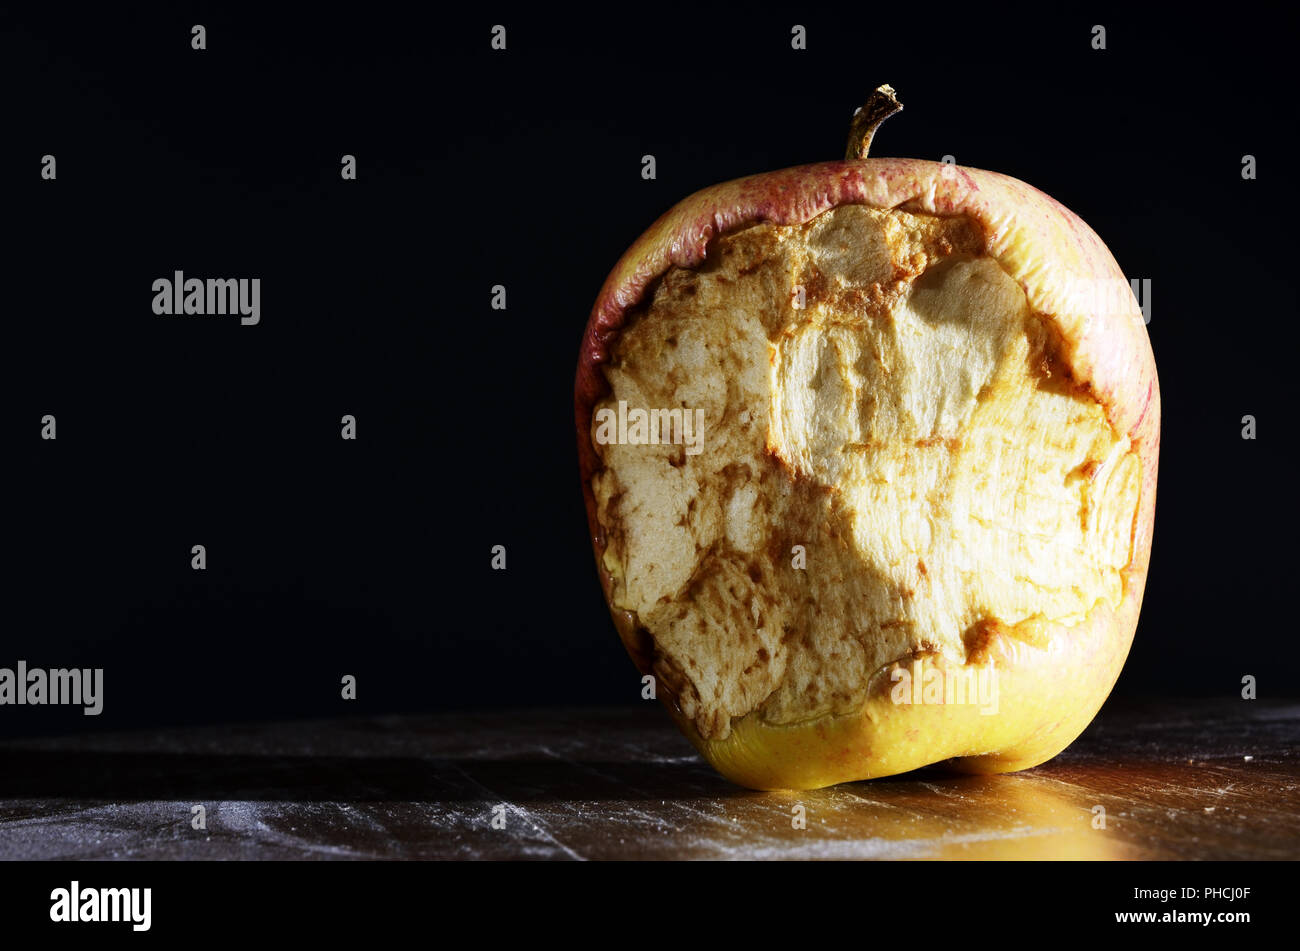 bitten apple on a dark background - Stock Image